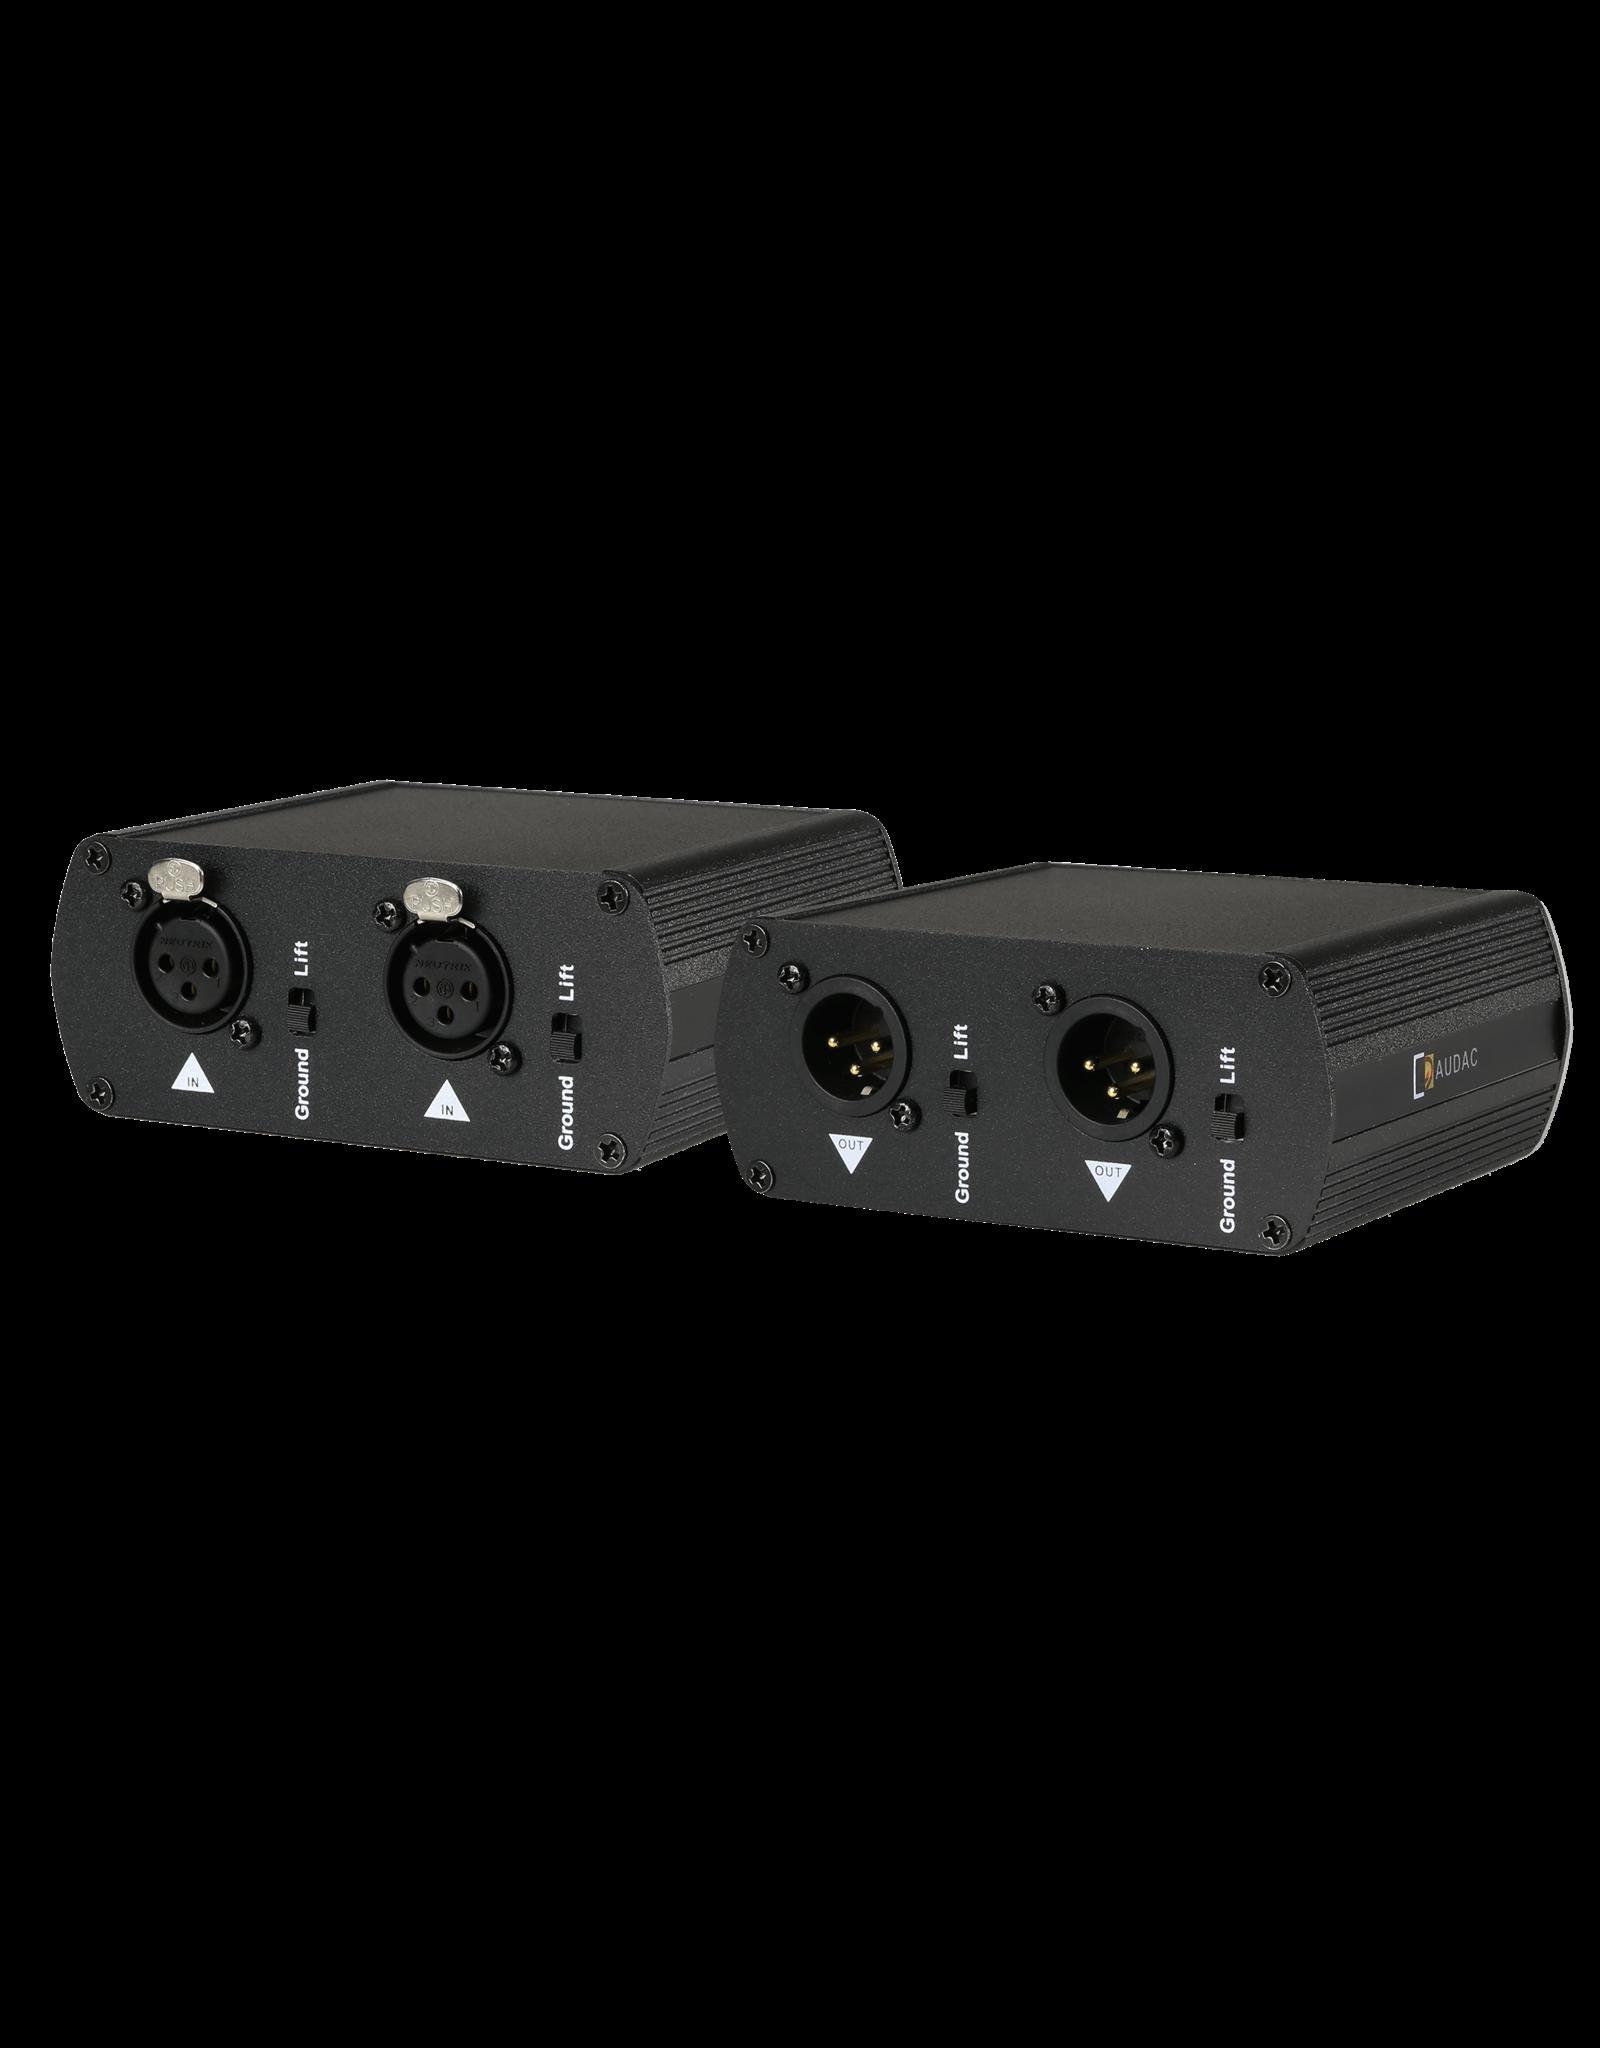 Audac Audio line isolator Super shielded